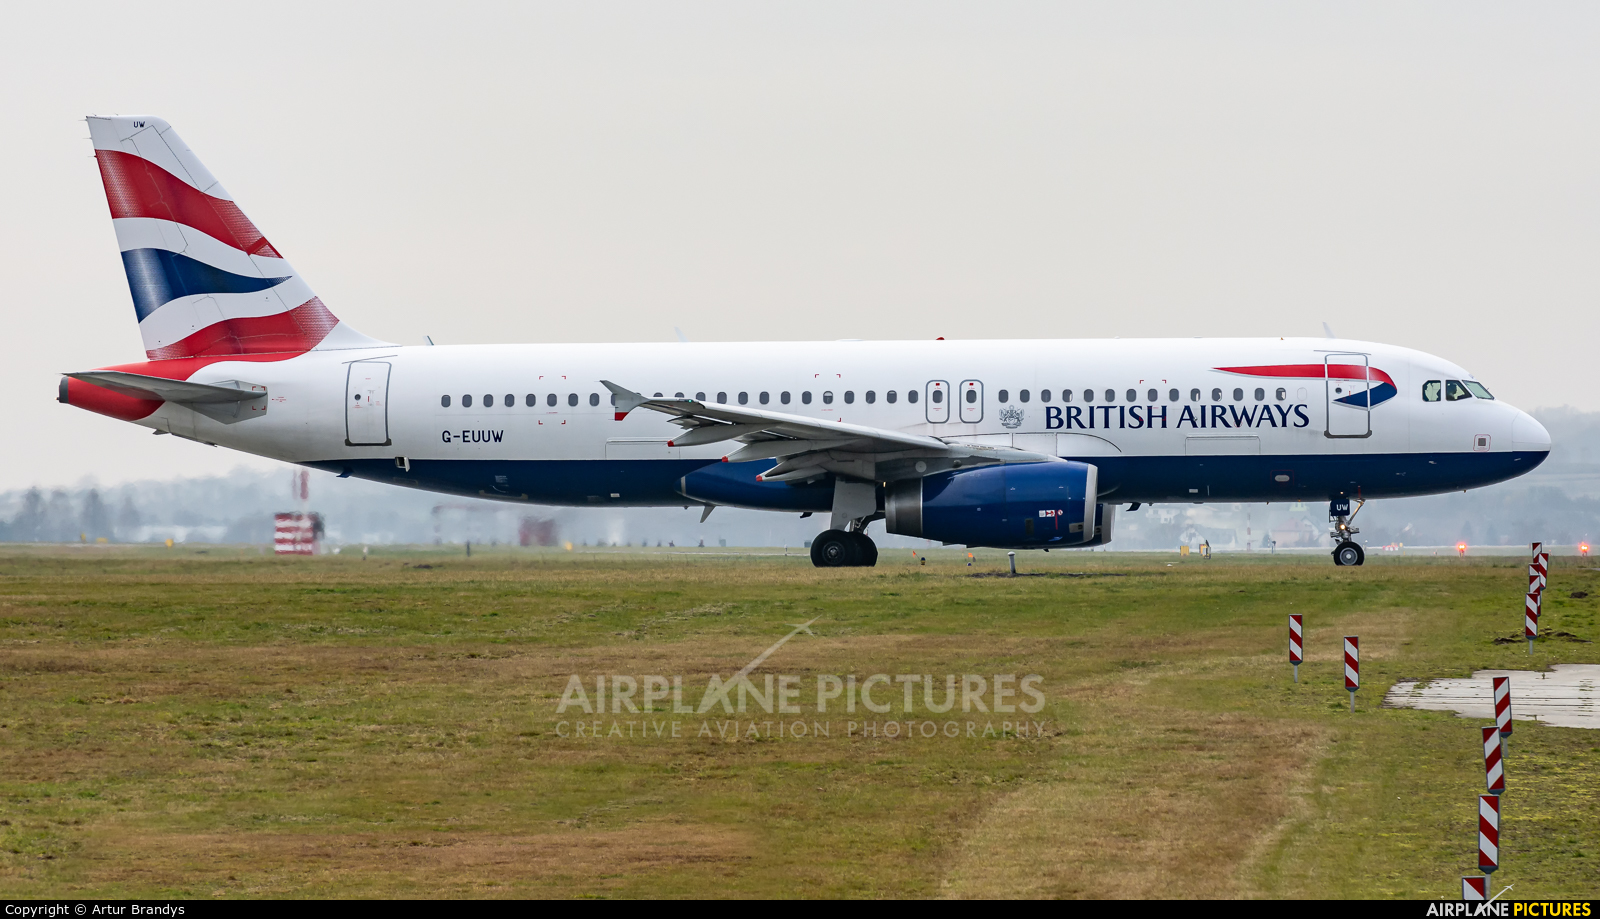 British Airways G-EUUW aircraft at Kraków - John Paul II Intl